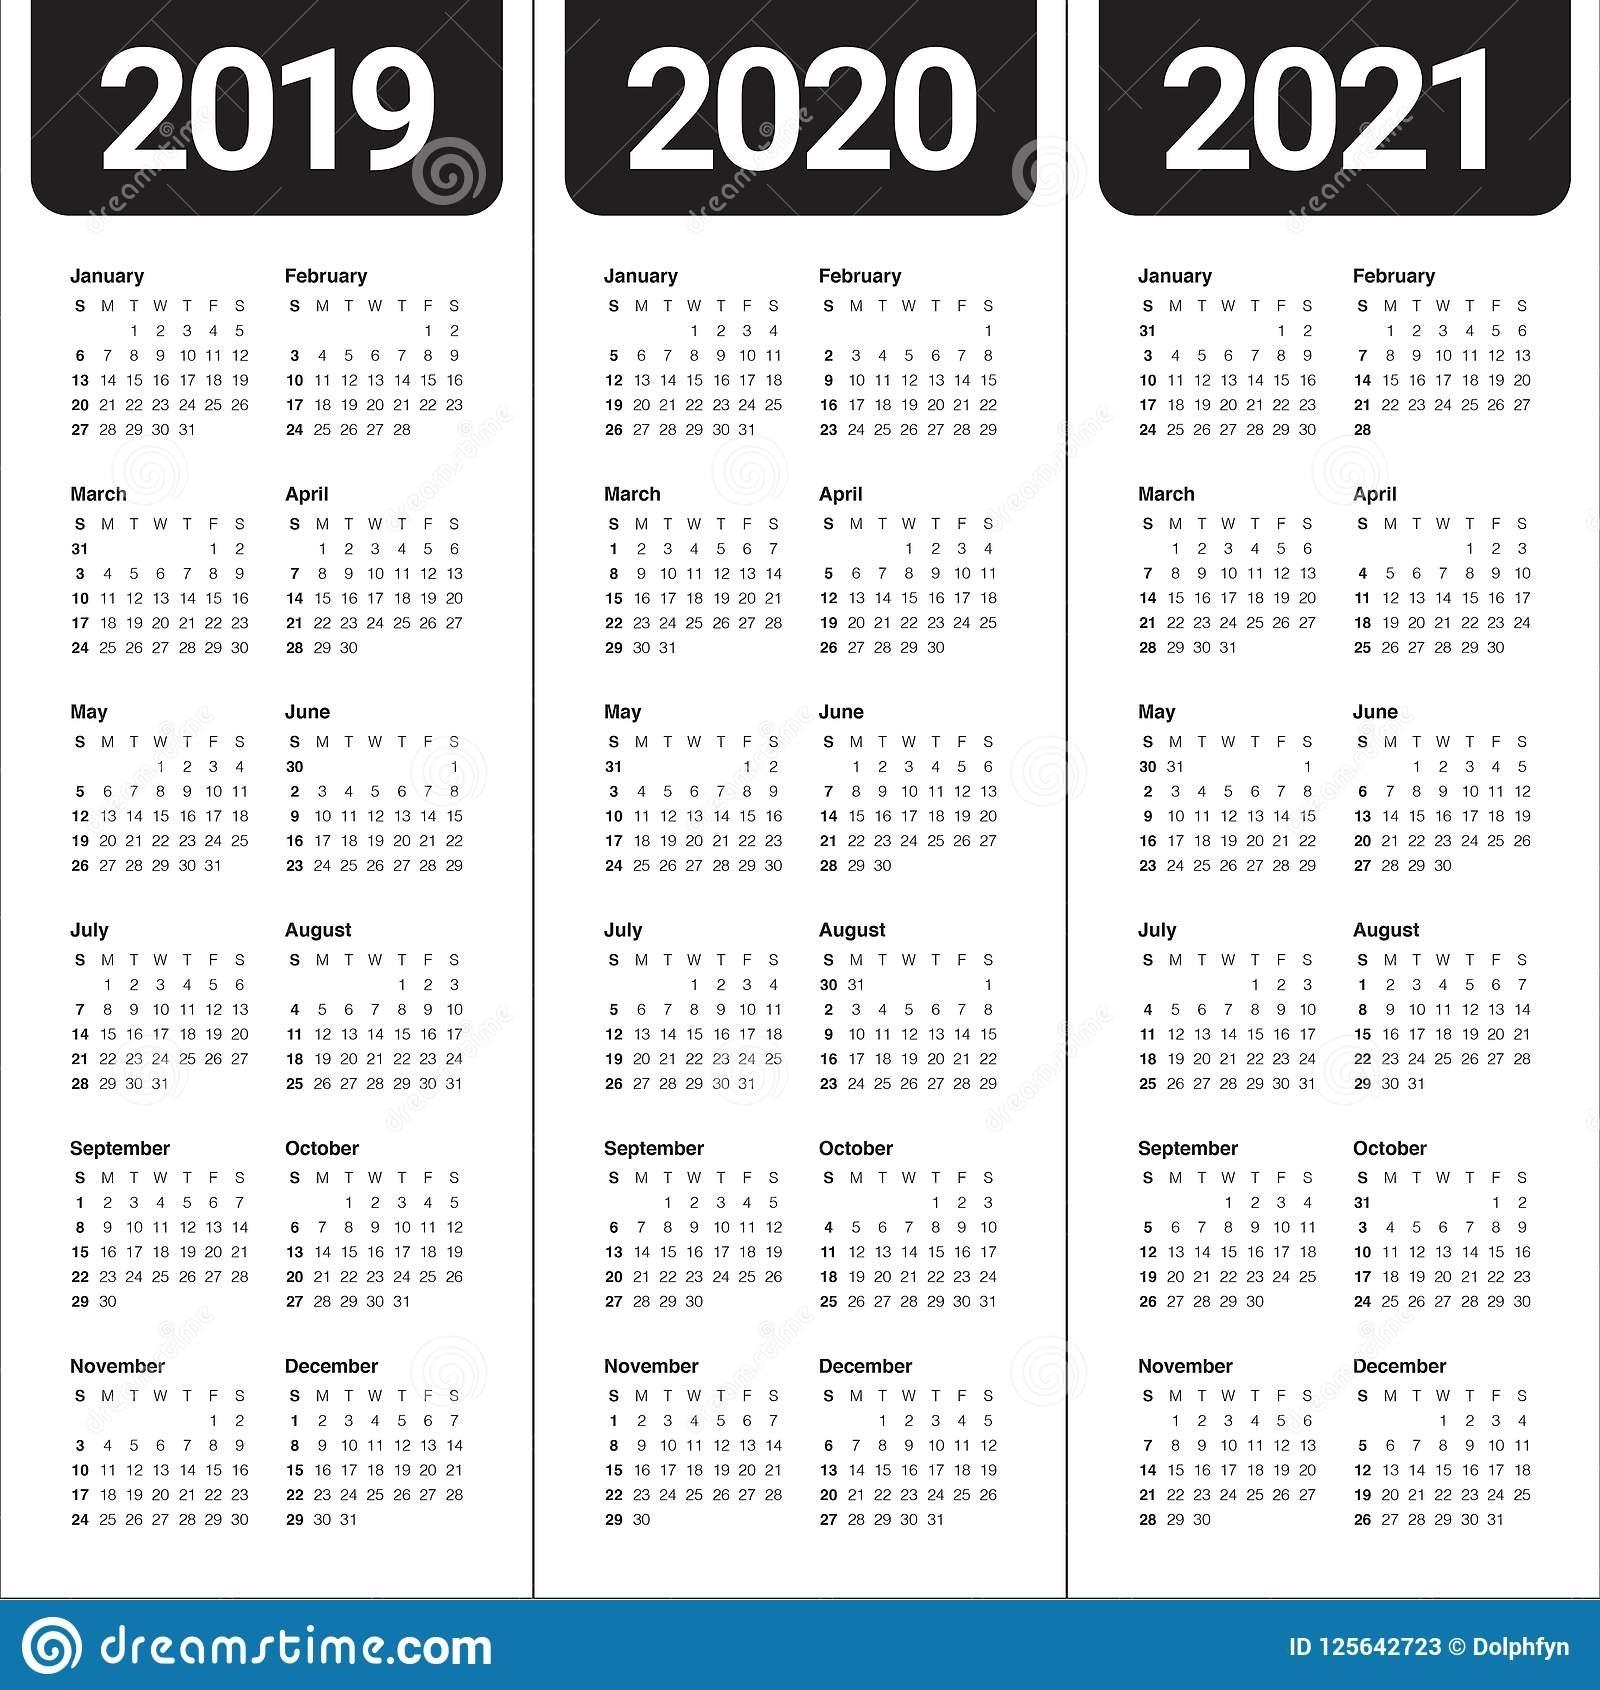 Year 2019 2020 2021 Calendar Vector Design Template Stock Vector inside U Of L 2019/2020 Calendar